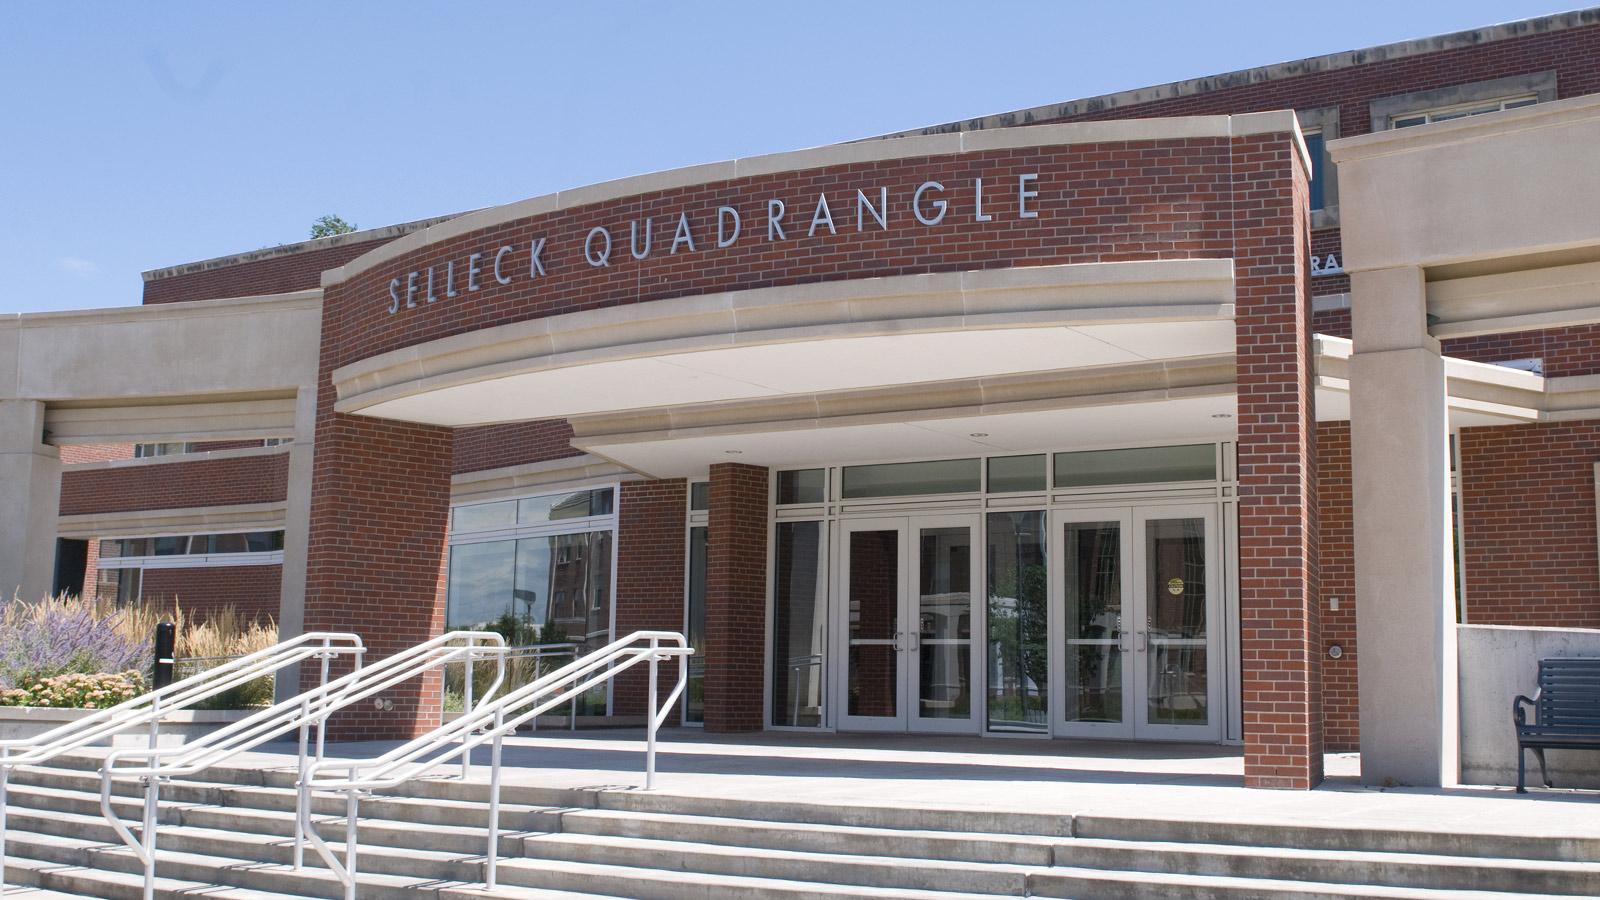 Selleck Quadrangle exterior photo